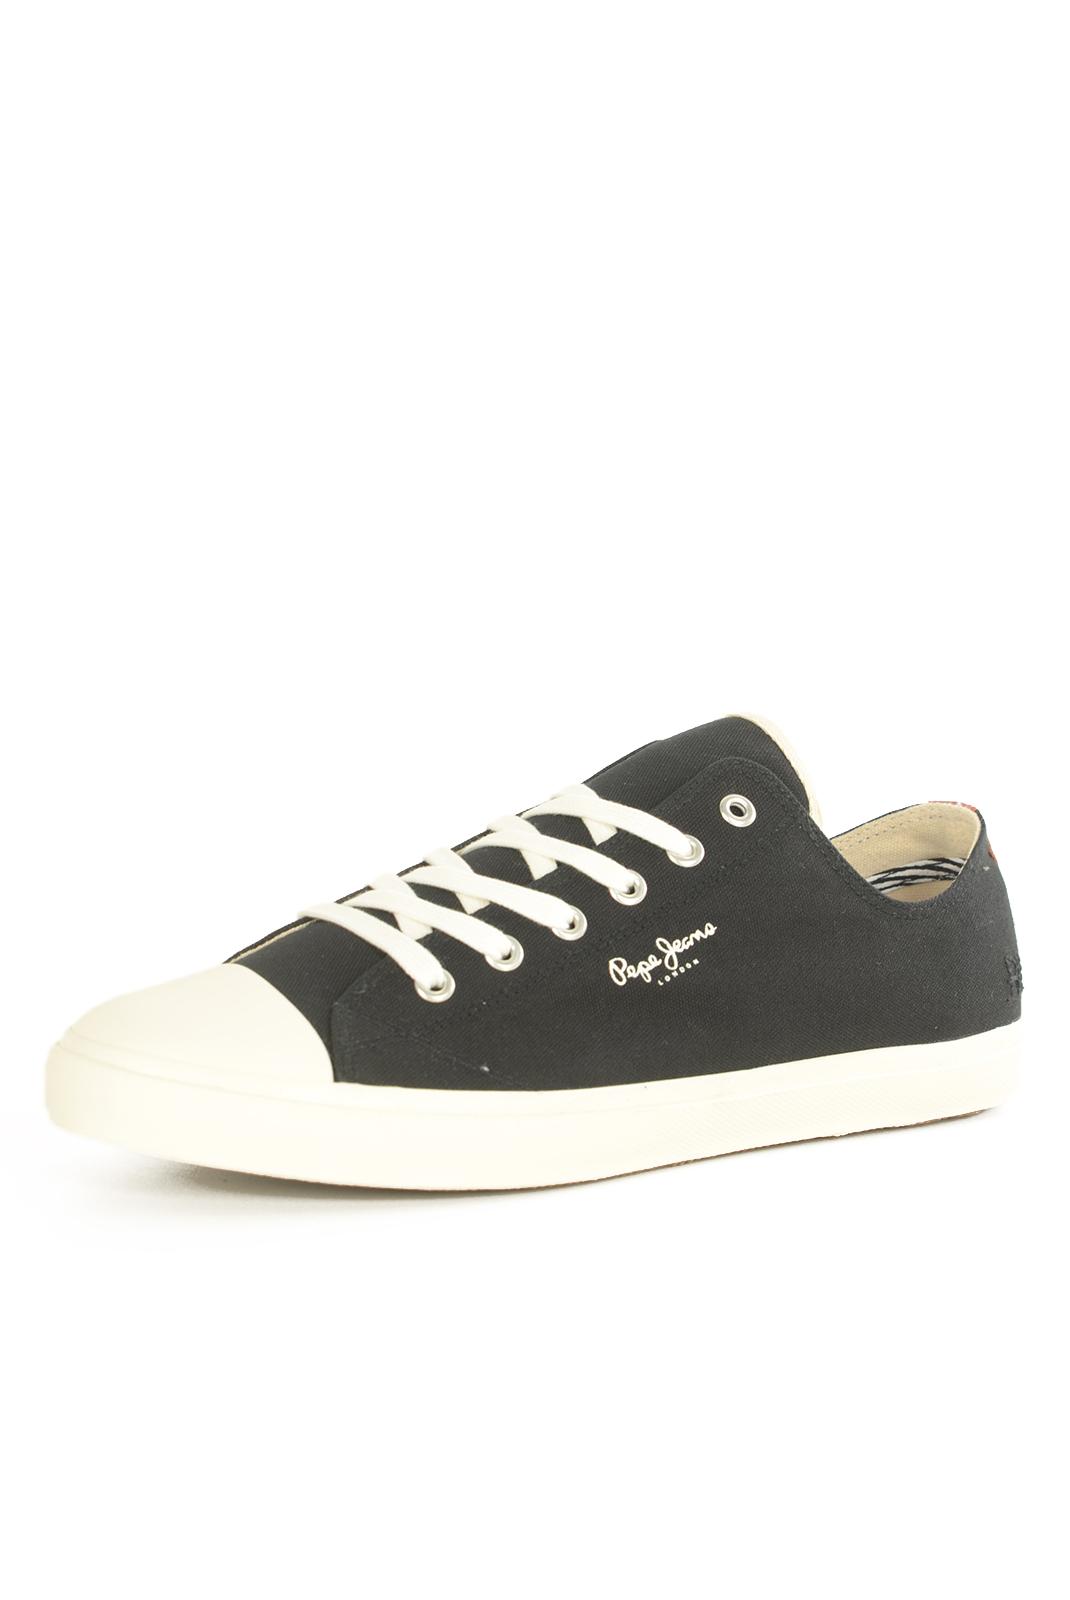 Baskets / Sport  Pepe jeans PMS30329 TOKIO COURT 999 BLACK